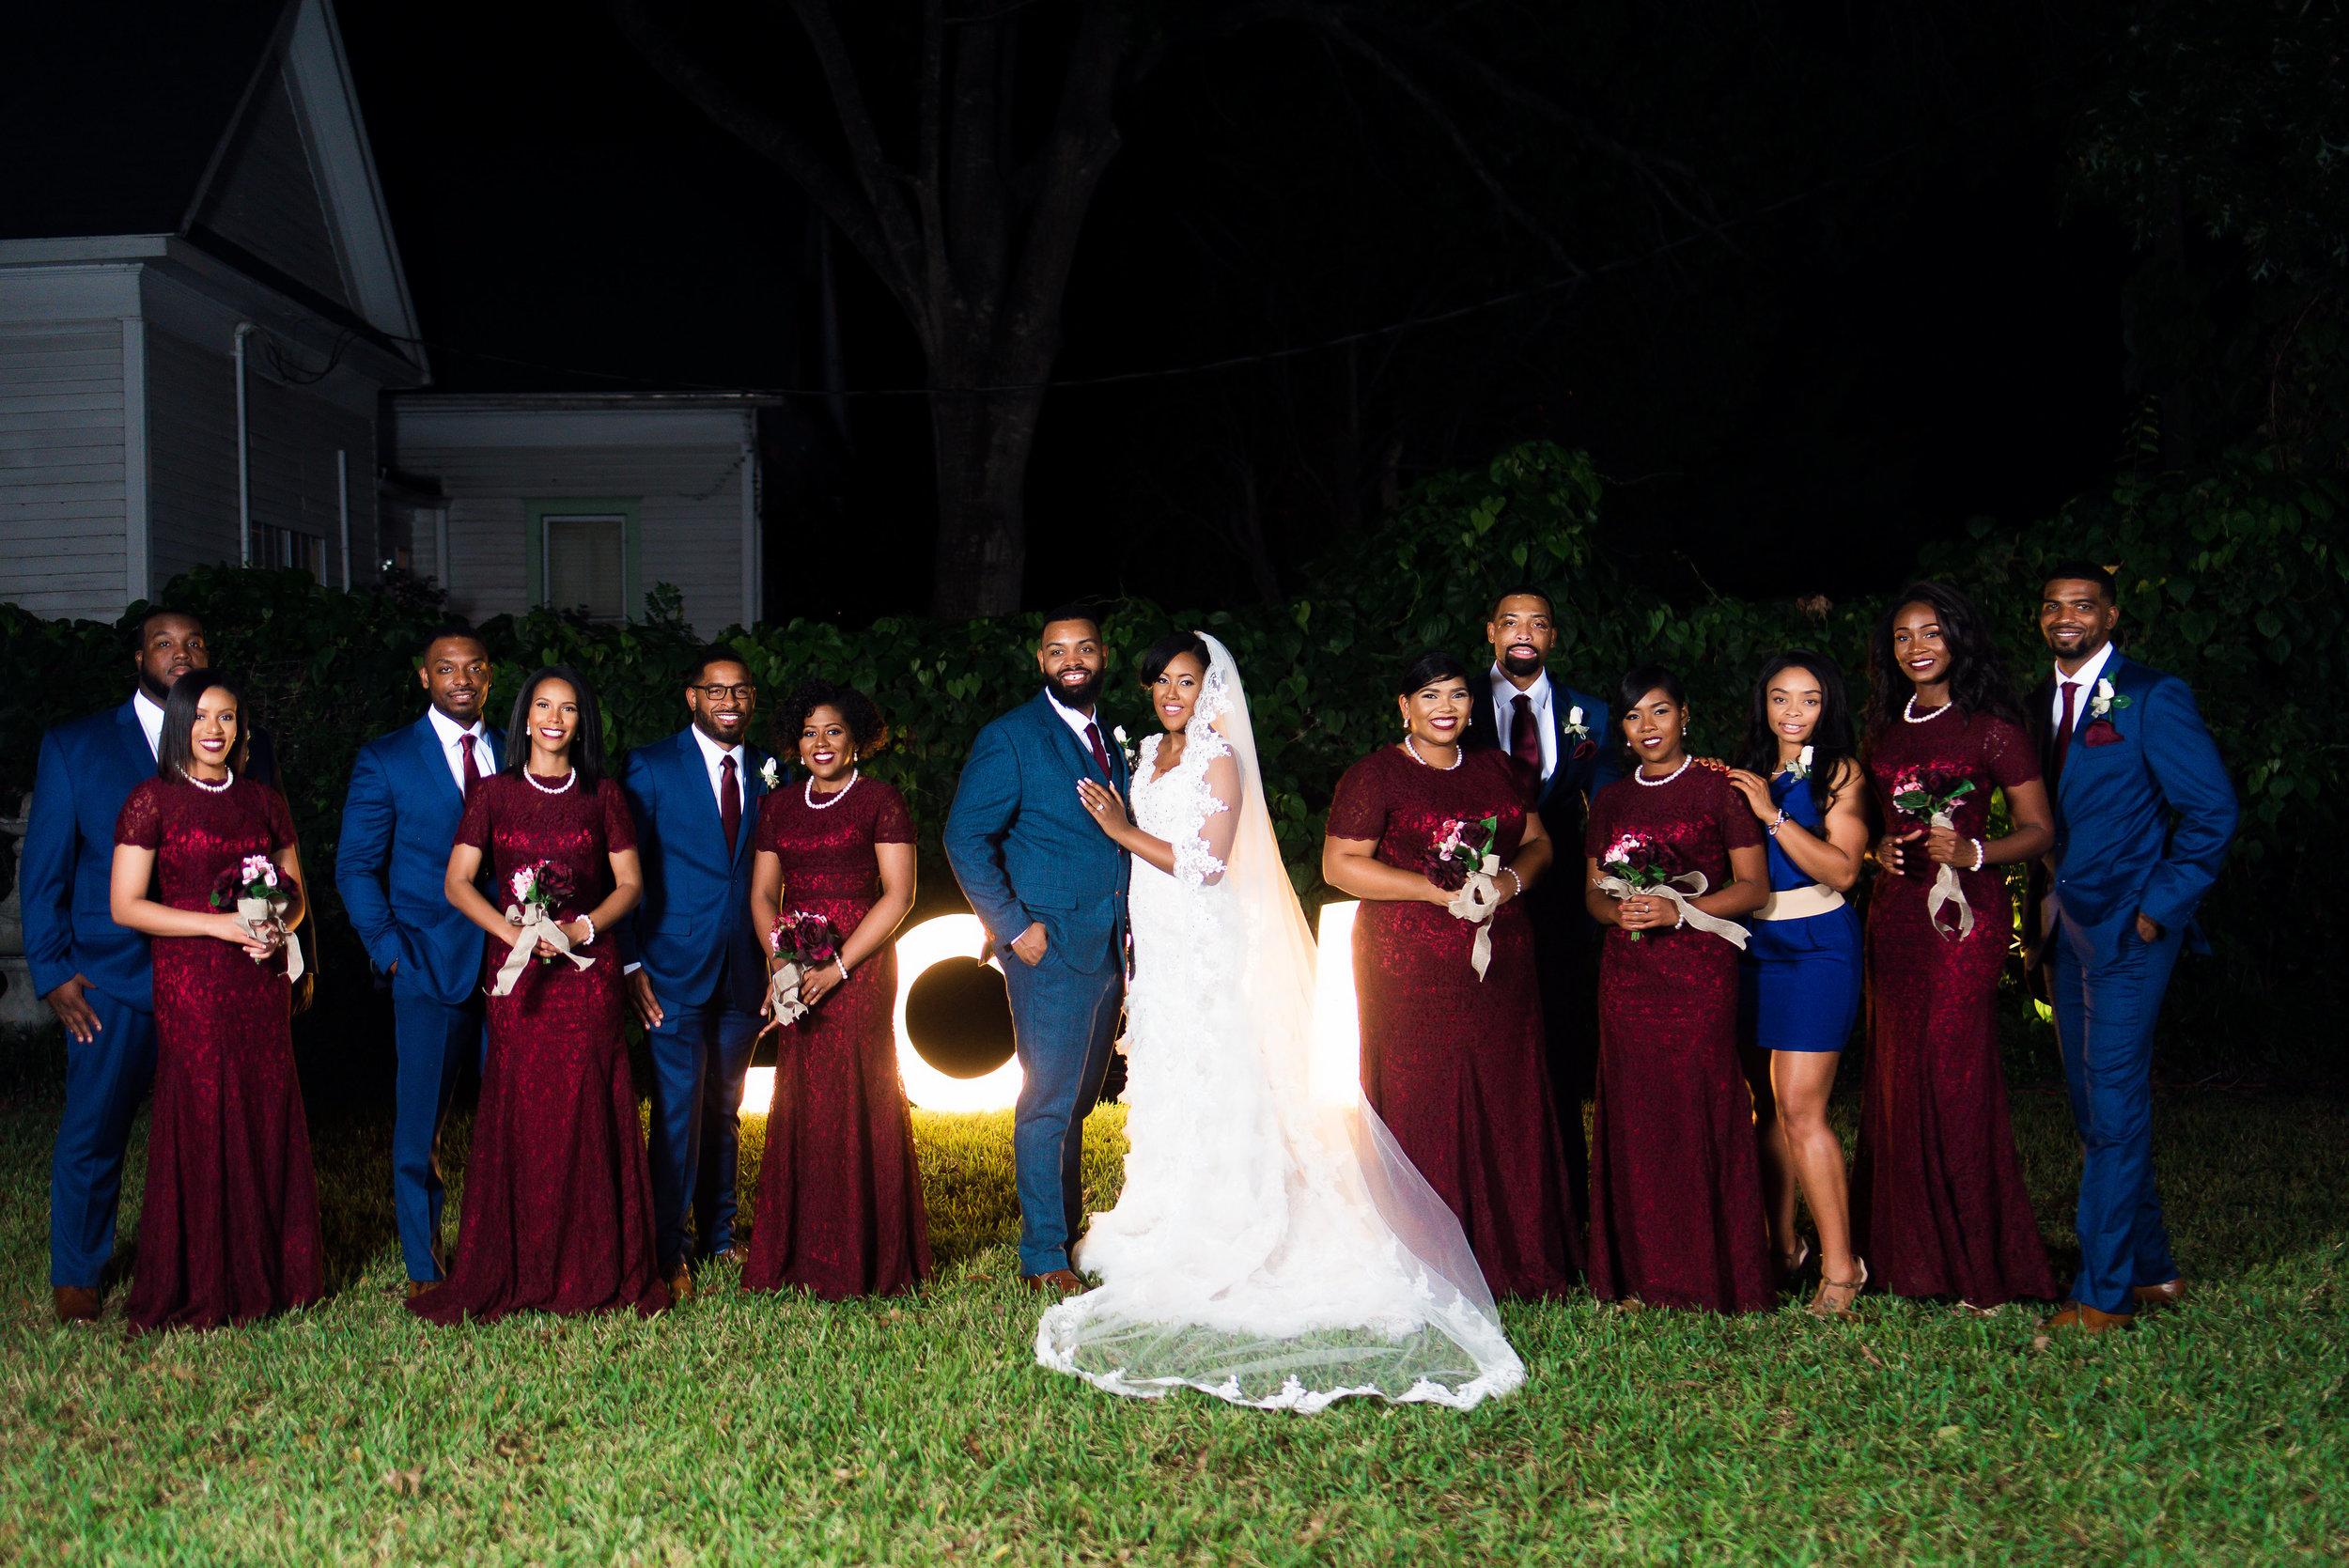 TC-Jessica-Garr-Pharris-Photography-Real-Wedding-28.jpg